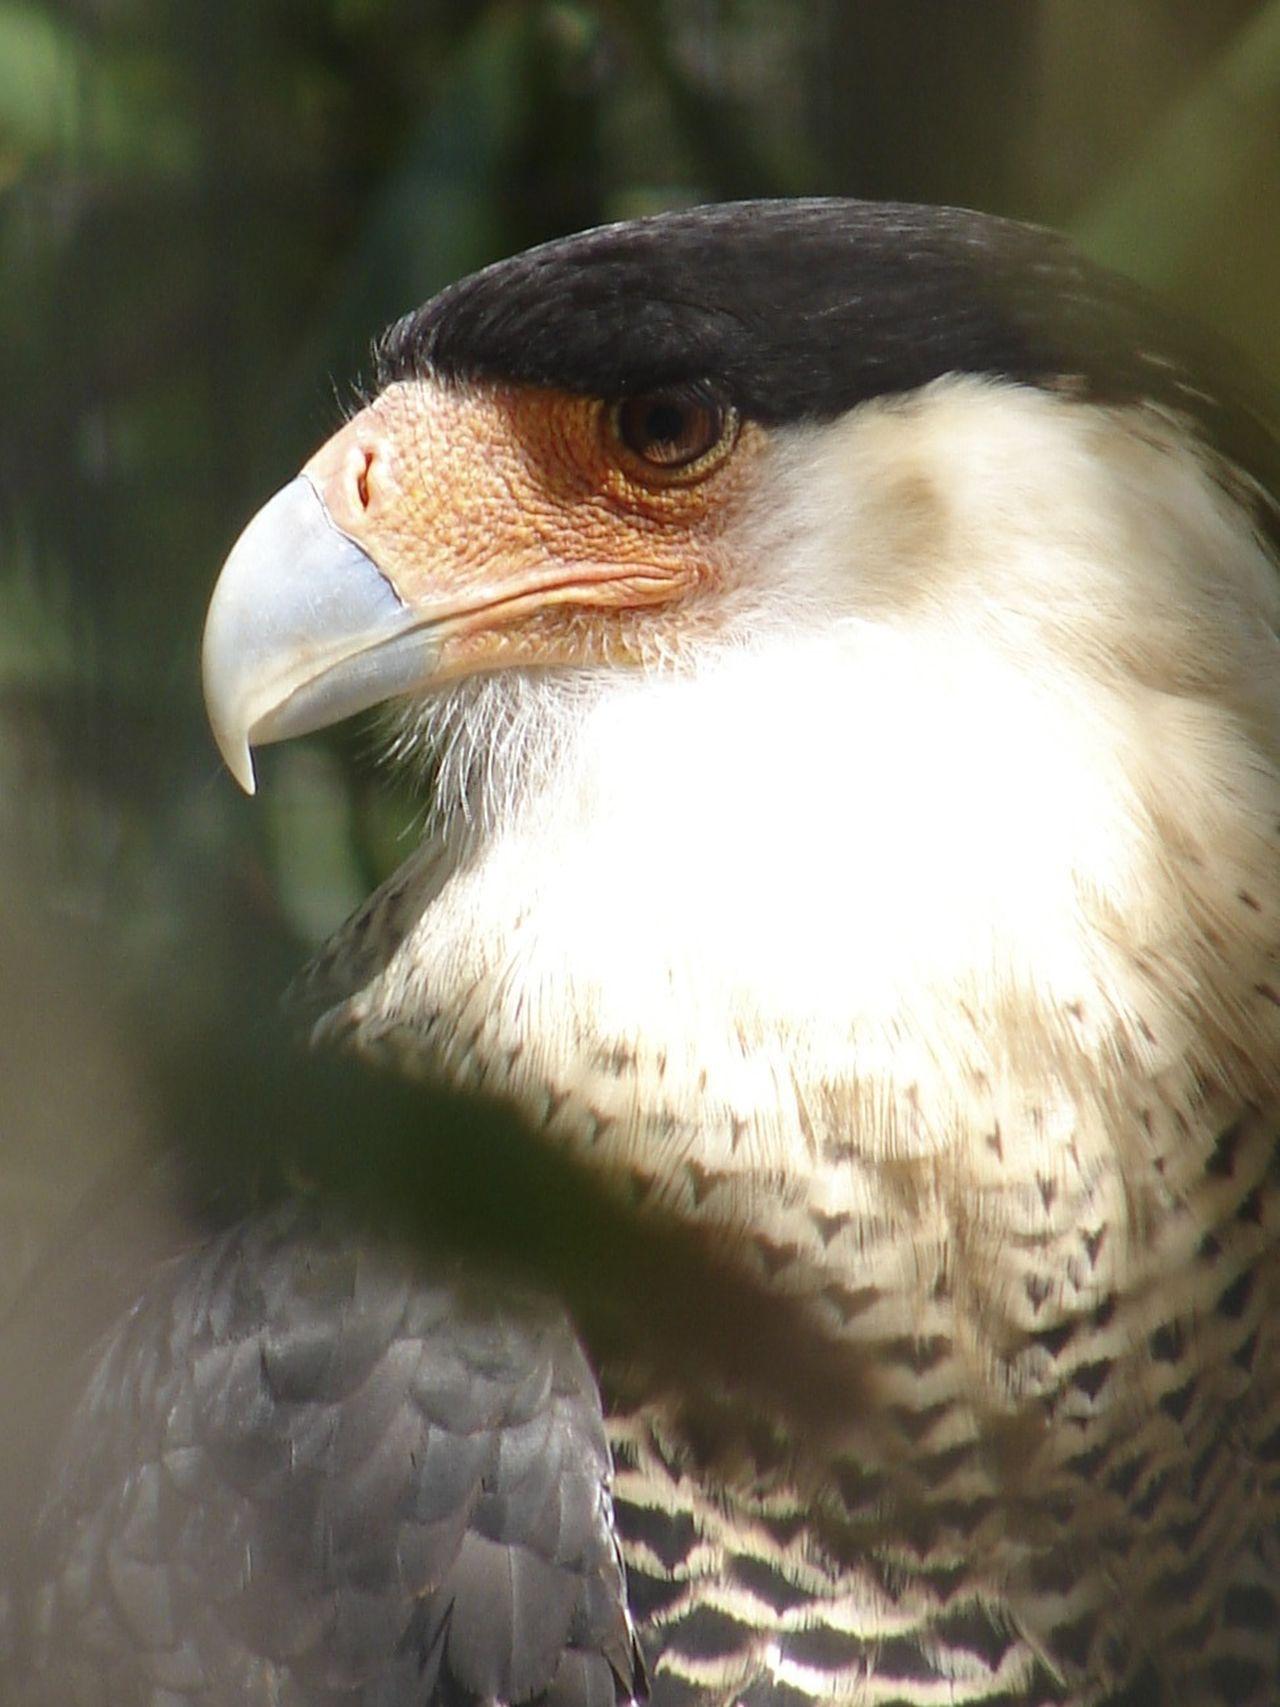 Alertness Beak Bird Bird In Captivity Cara Cara Focus On Foreground Nature Nature Photography One Animal Wild Wildlife Zoo